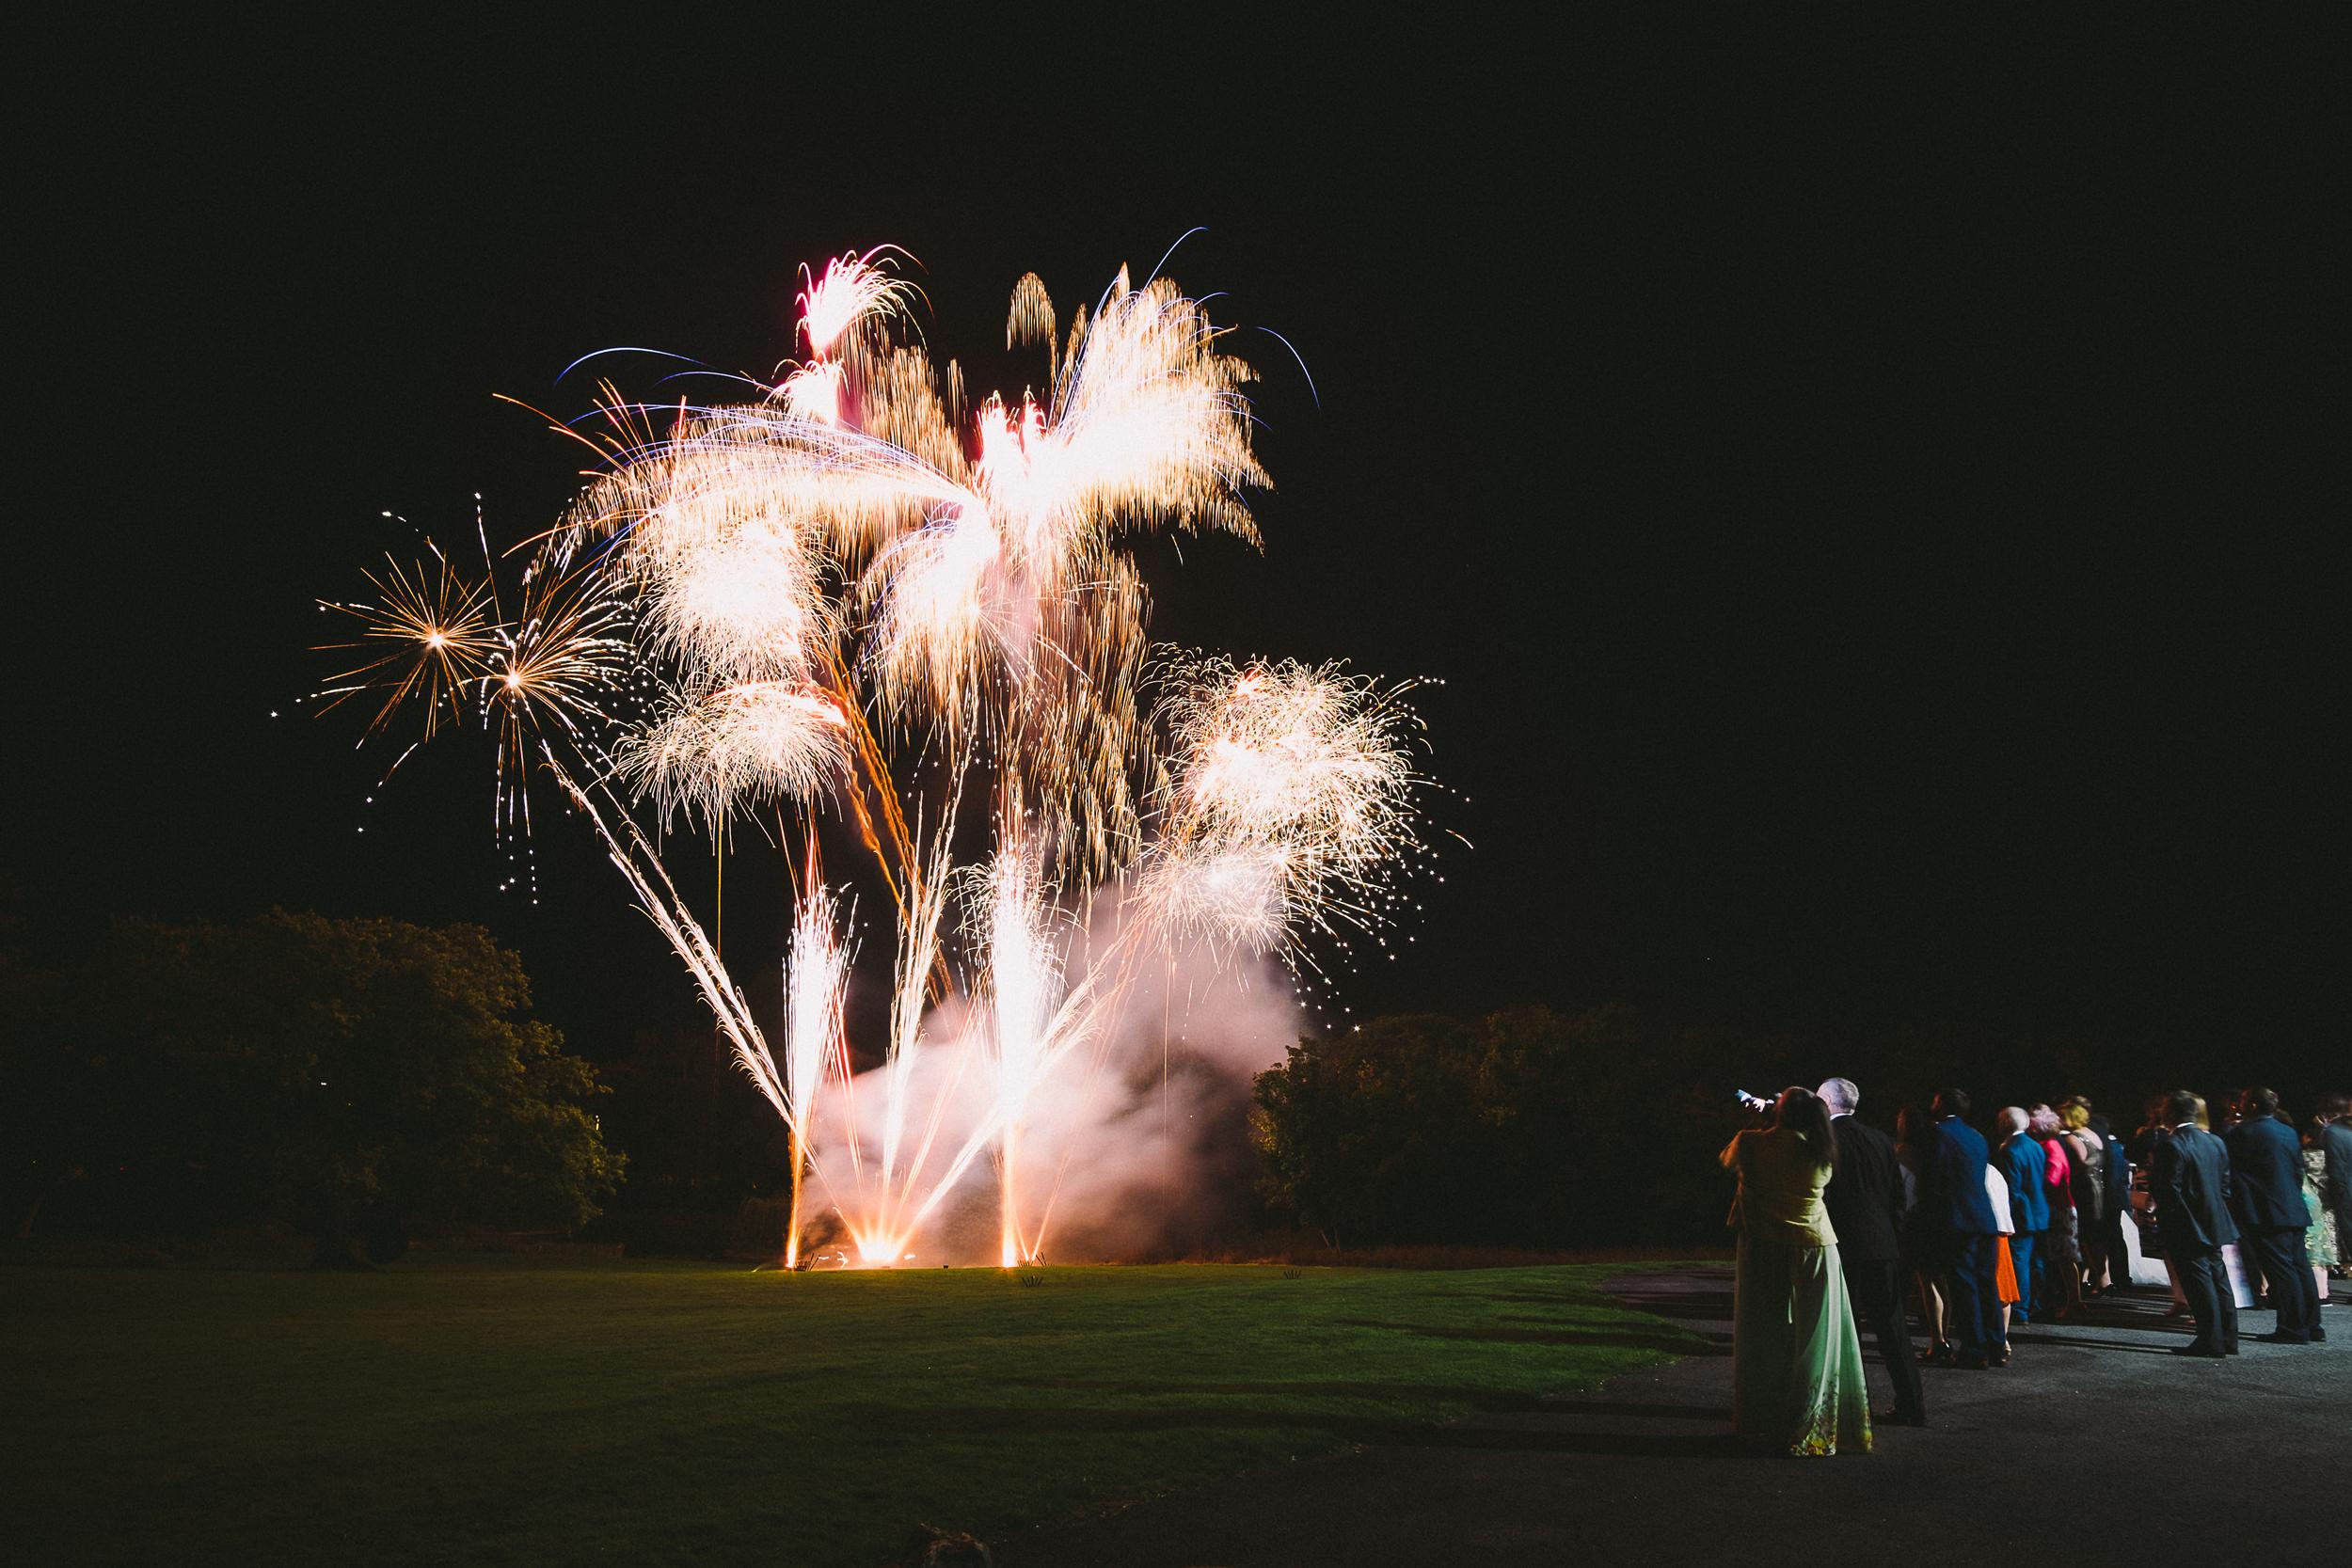 dan_emma_wedding-396.jpg